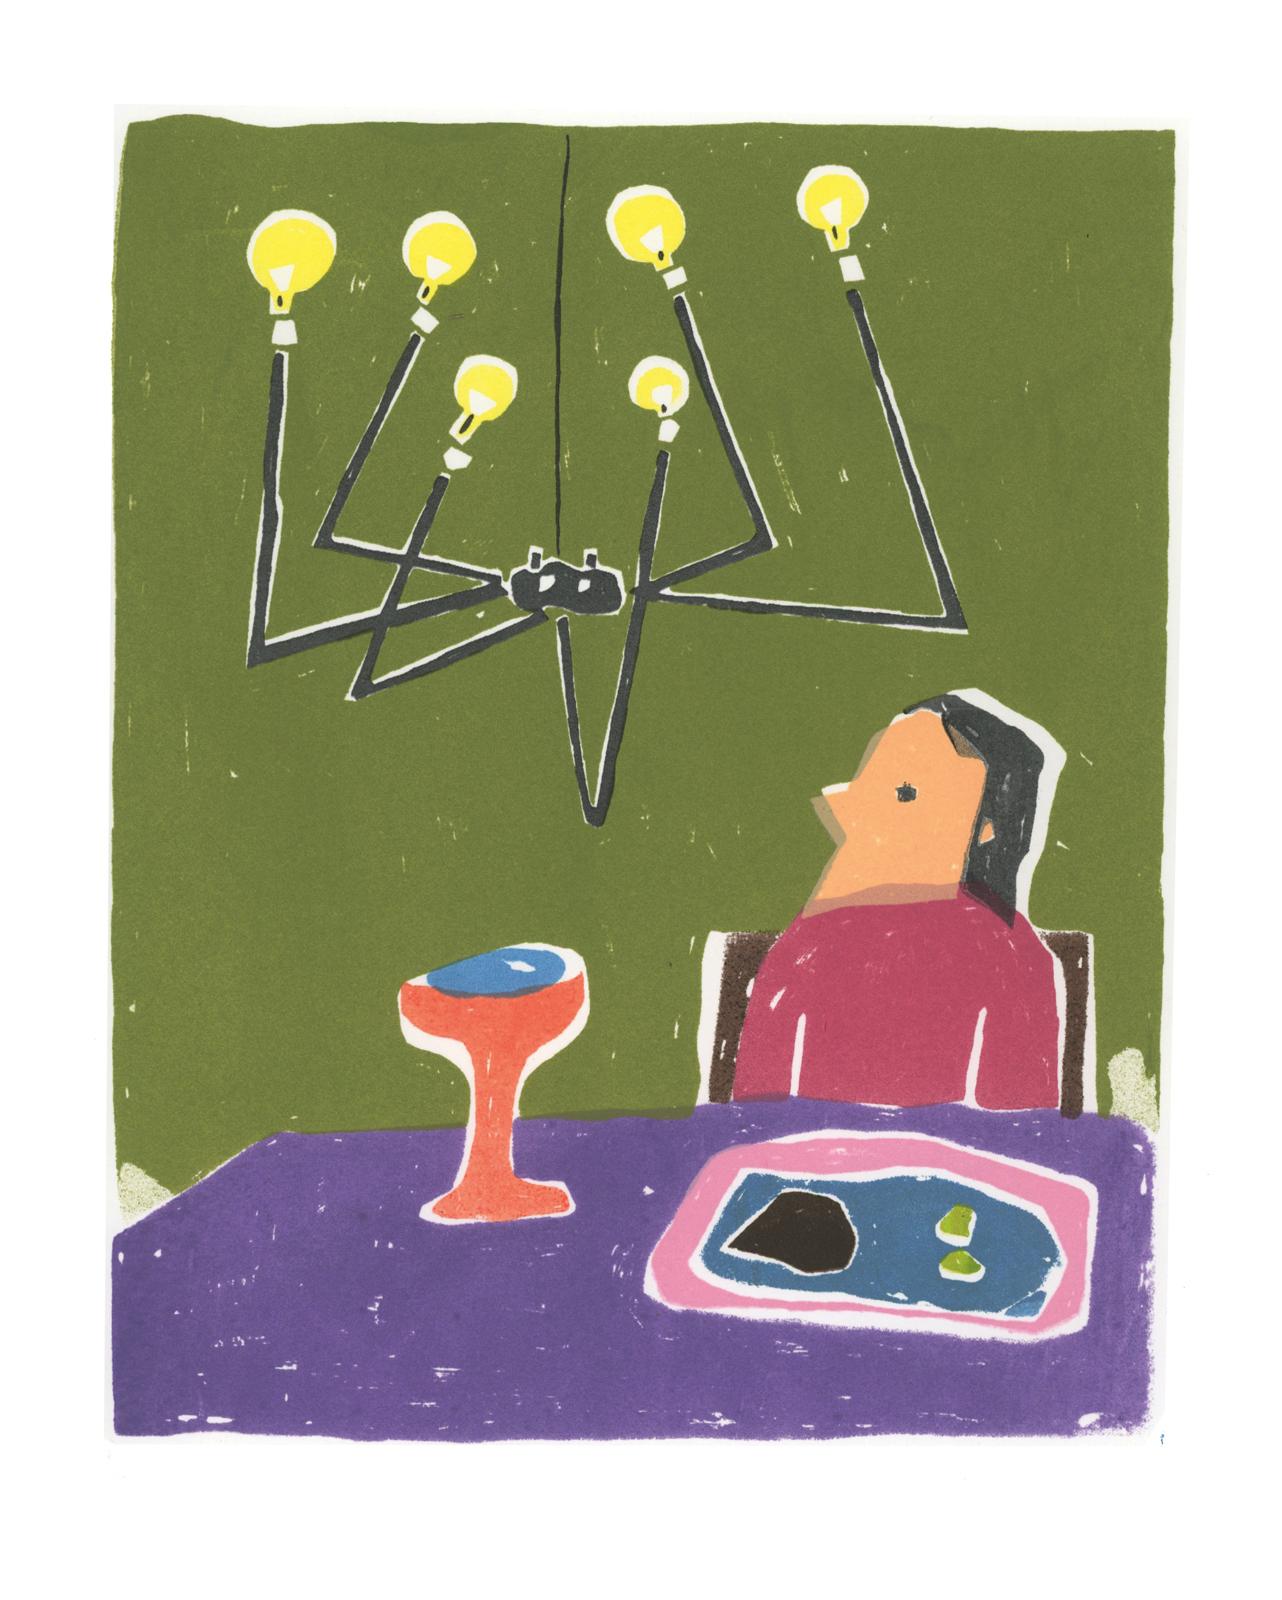 Illustration by Minha Jung